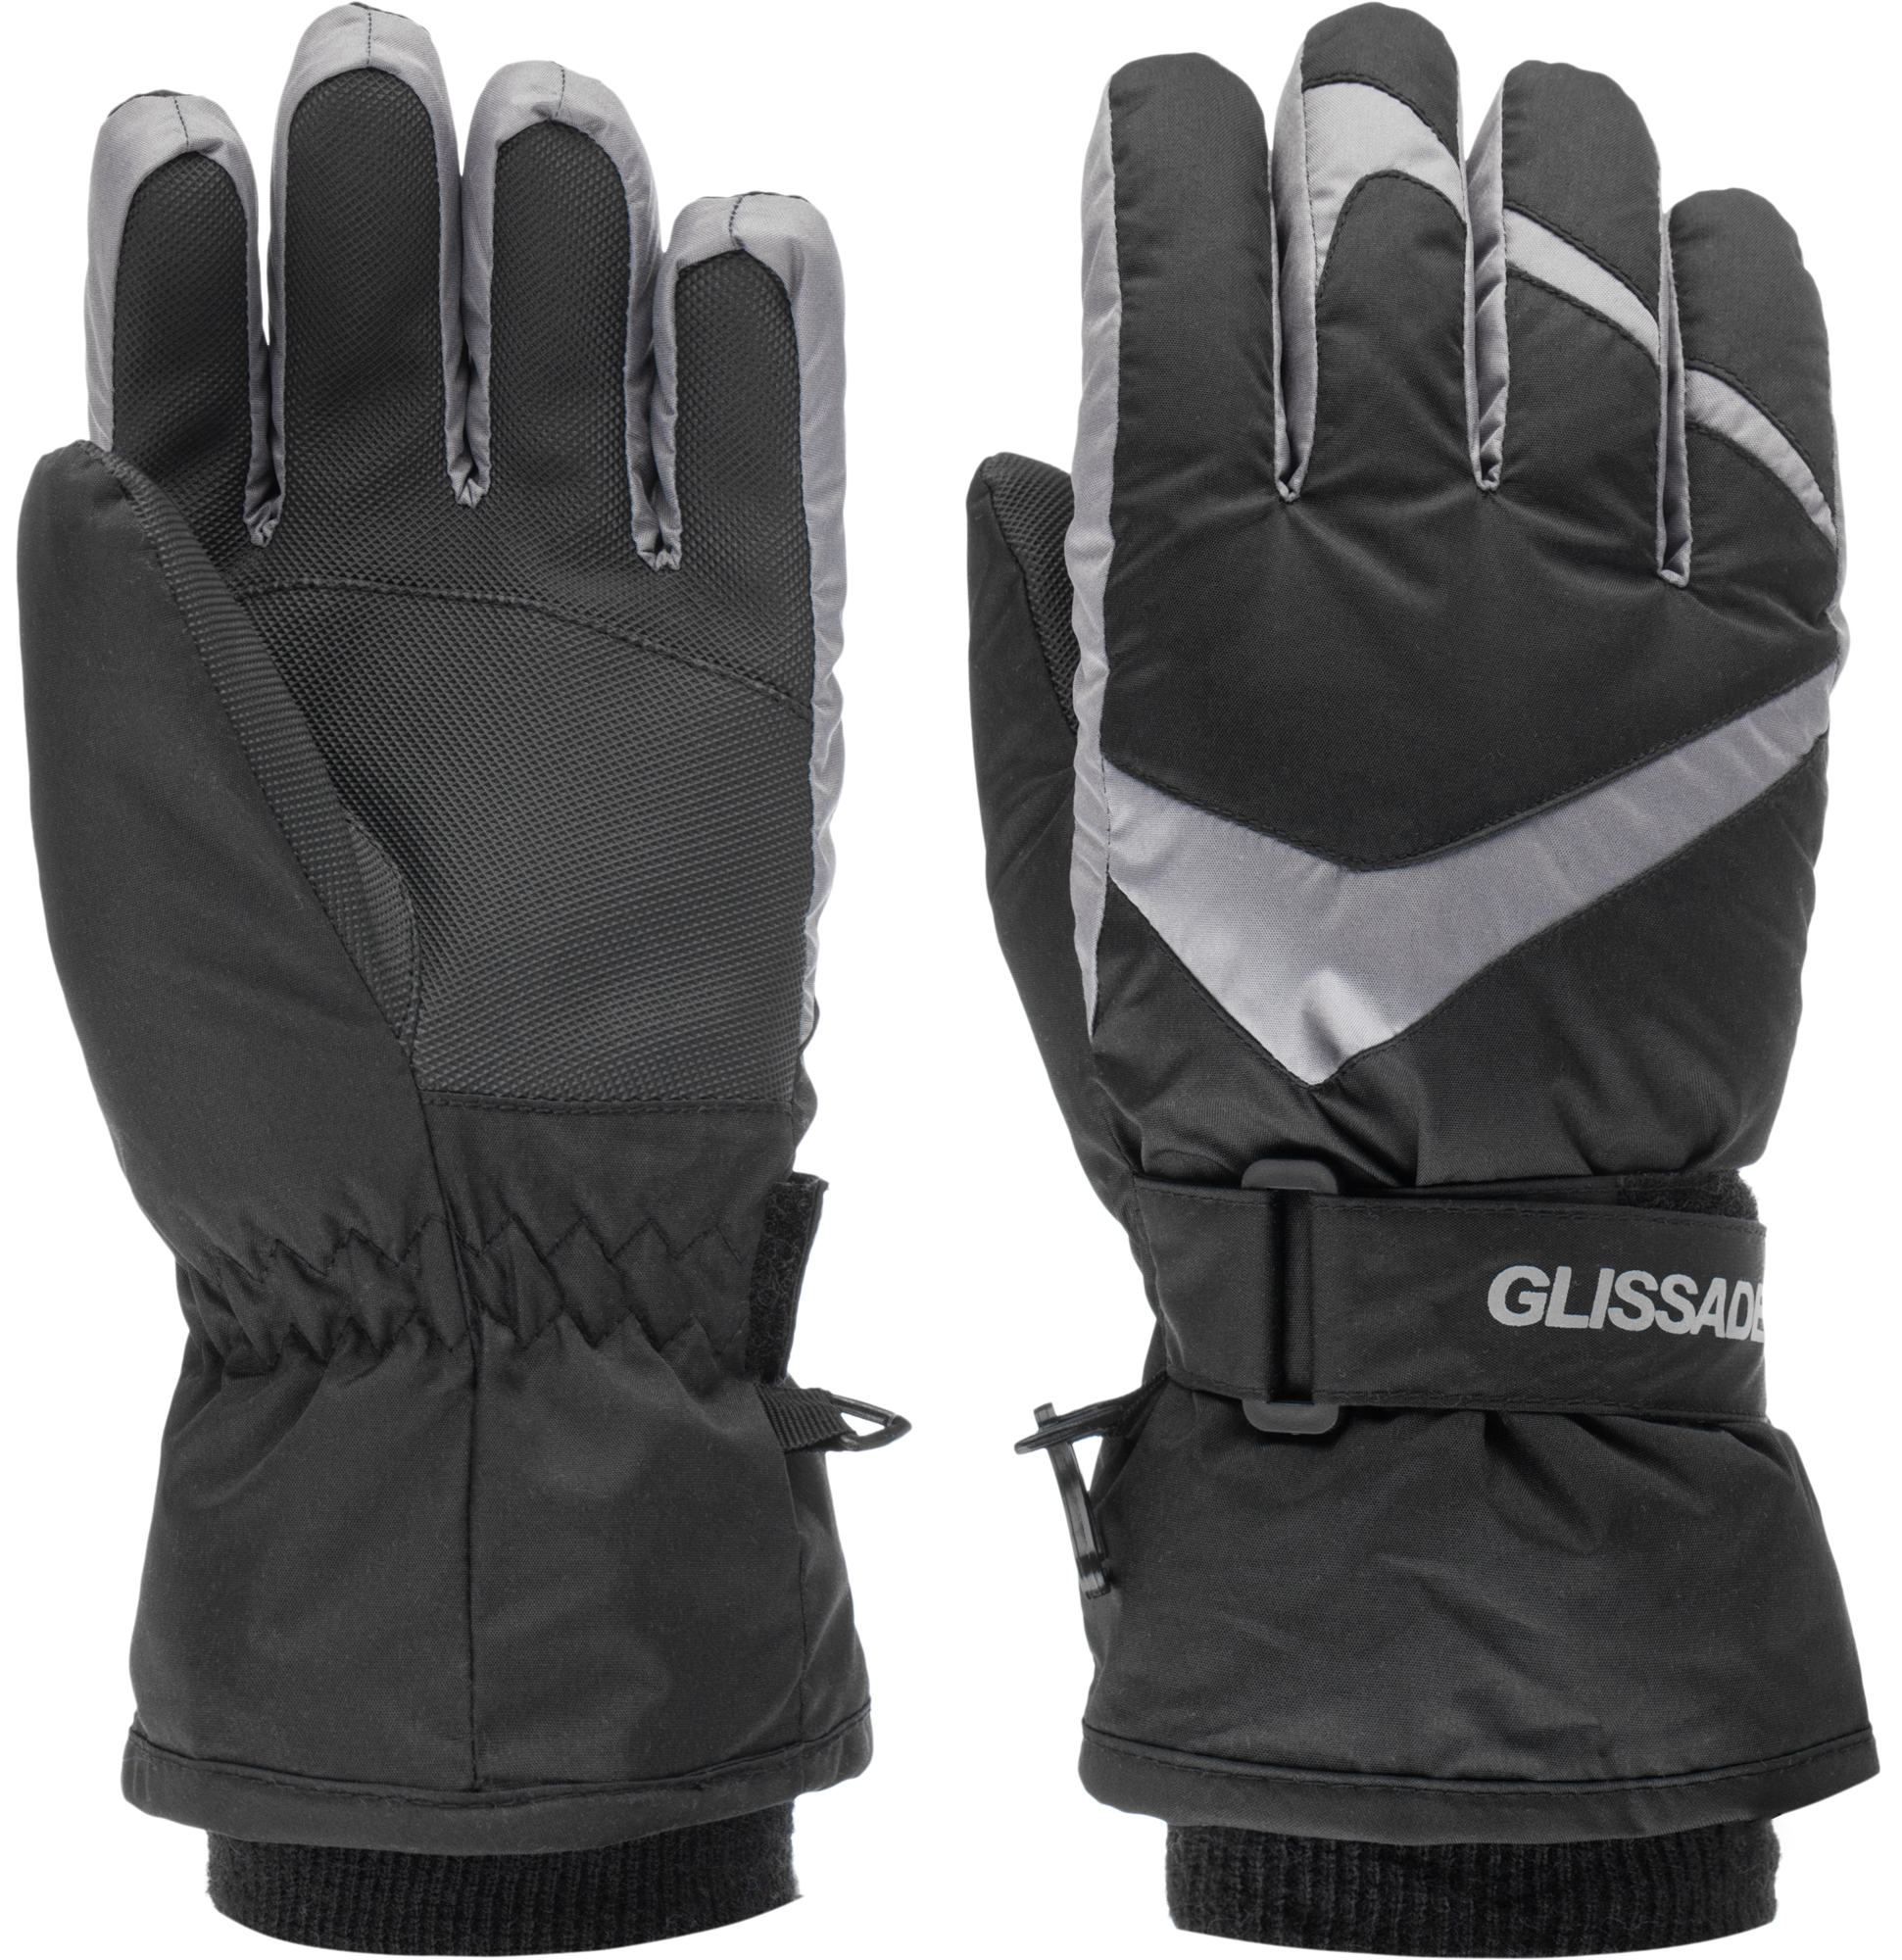 Glissade Перчатки для мальчиков Glissade, размер 4